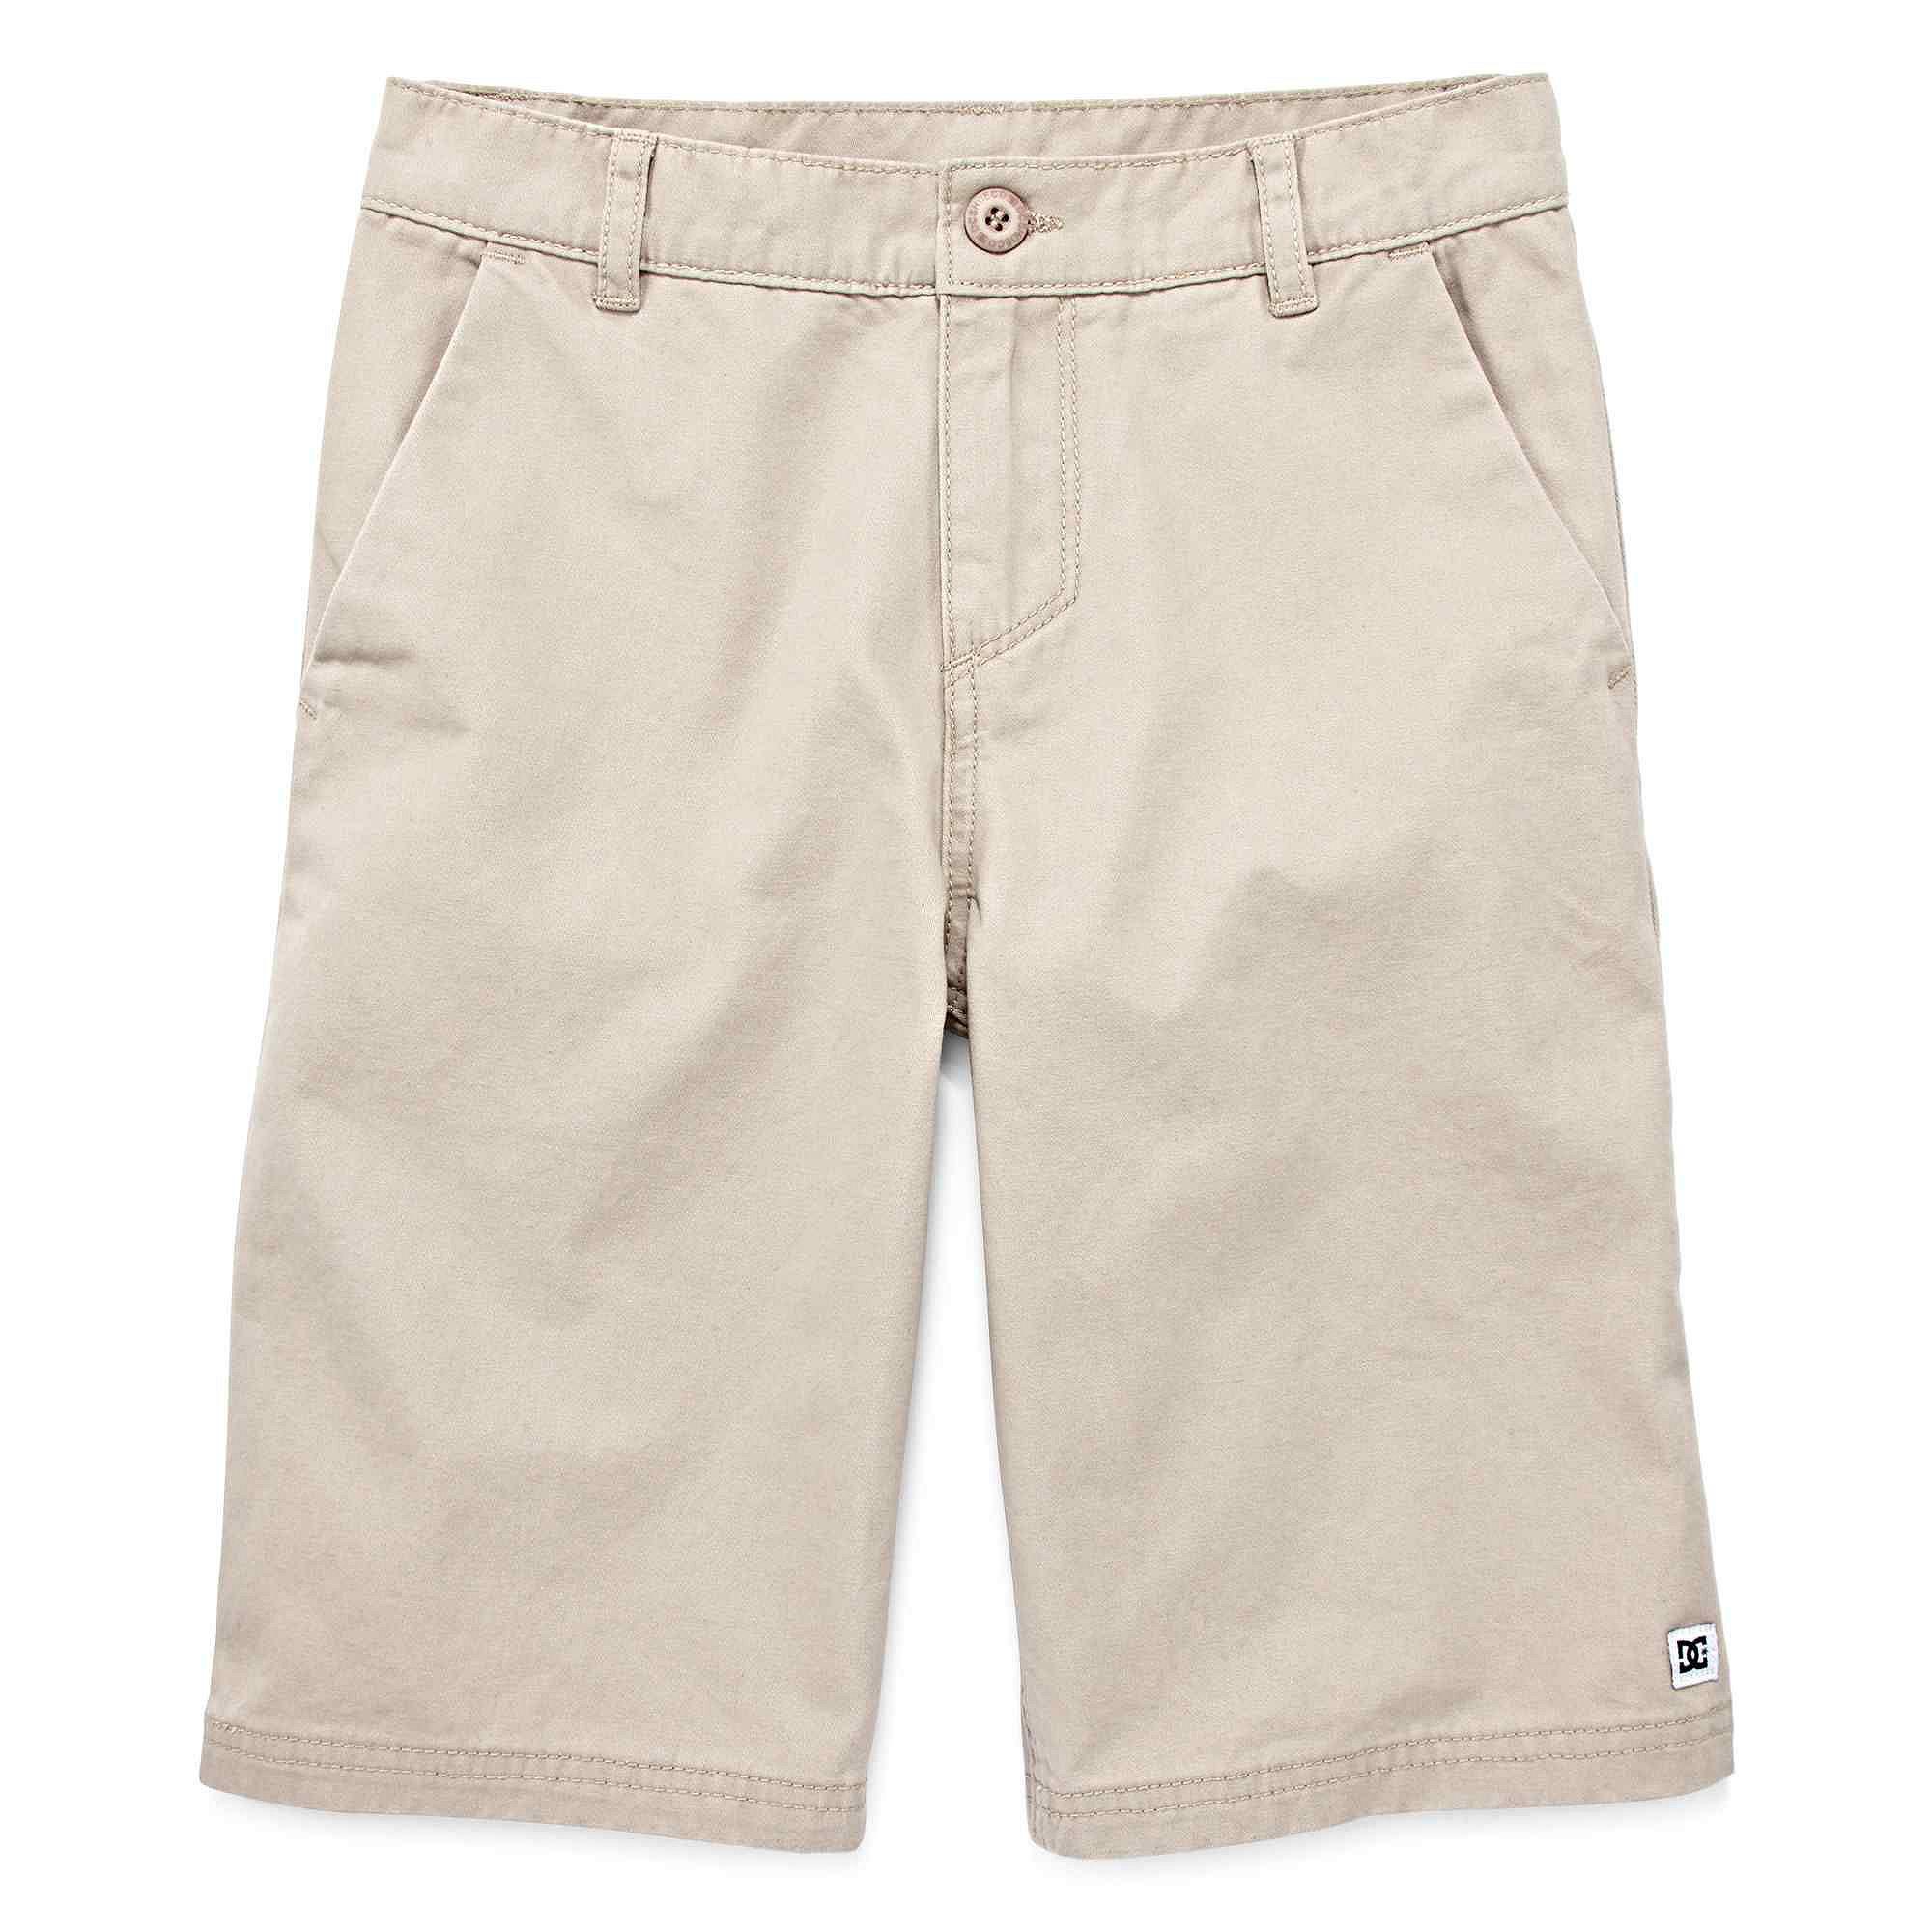 DC Shoes Co Chino Shorts - Boys 8-20